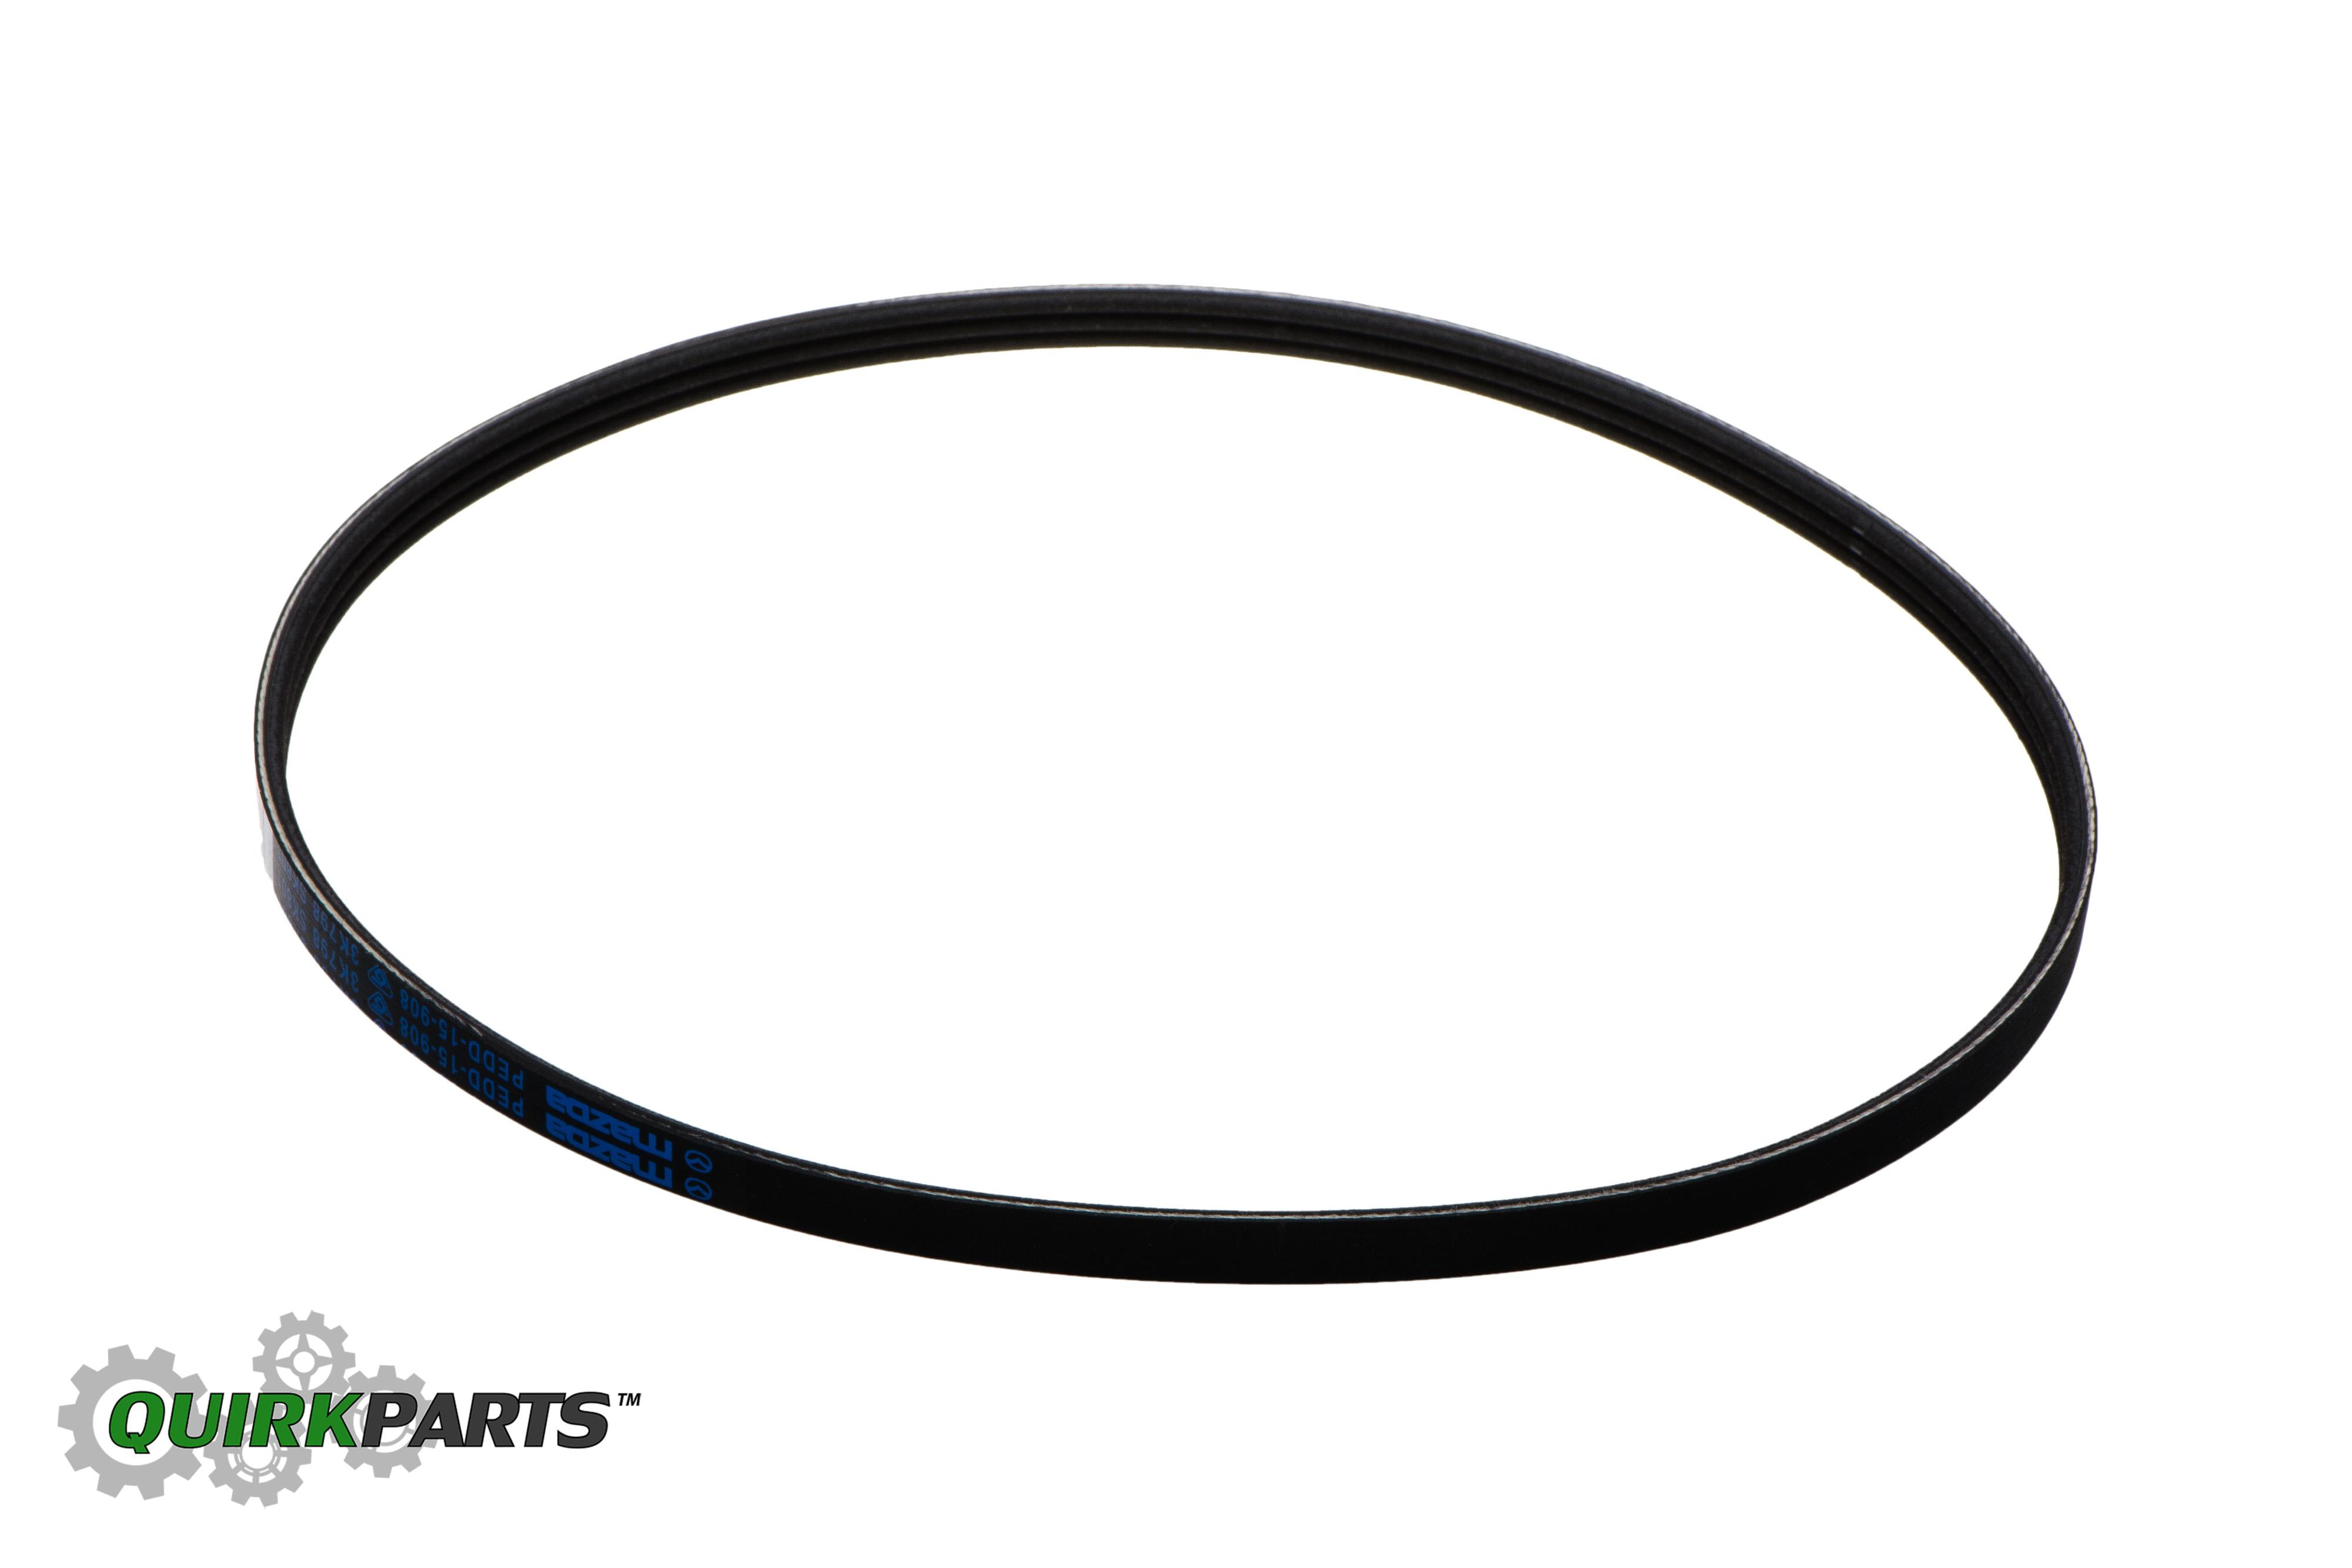 2012-2015 Mazda 3 CX-5 Serpentine Water Pump Belt OEM NEW